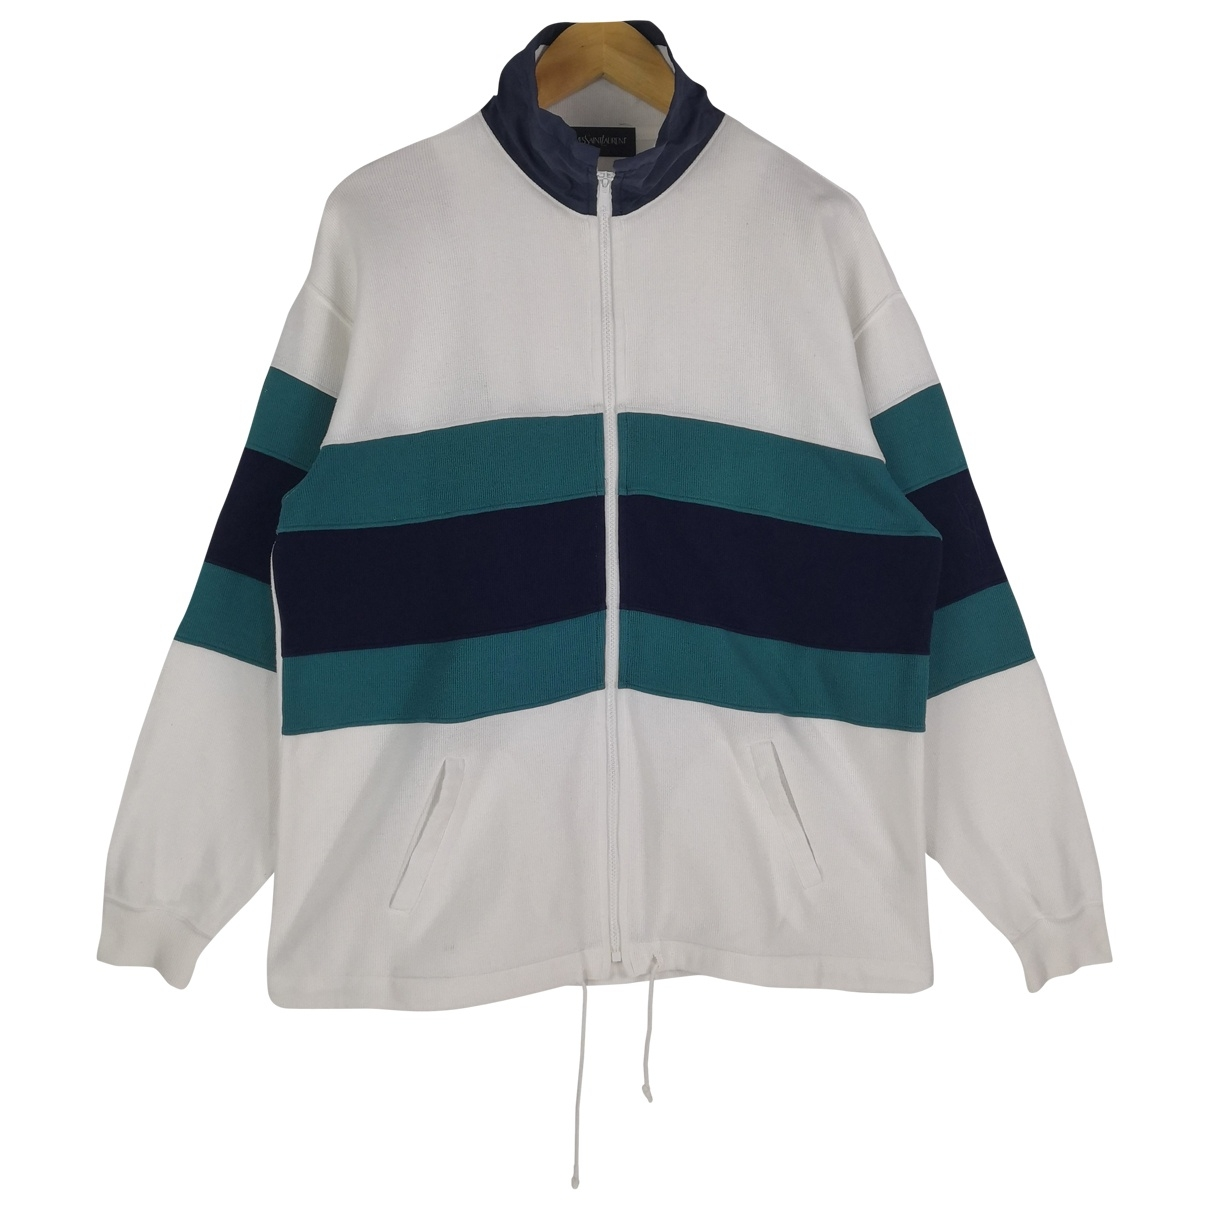 Yves Saint Laurent \N White Cotton Knitwear & Sweatshirts for Men M International